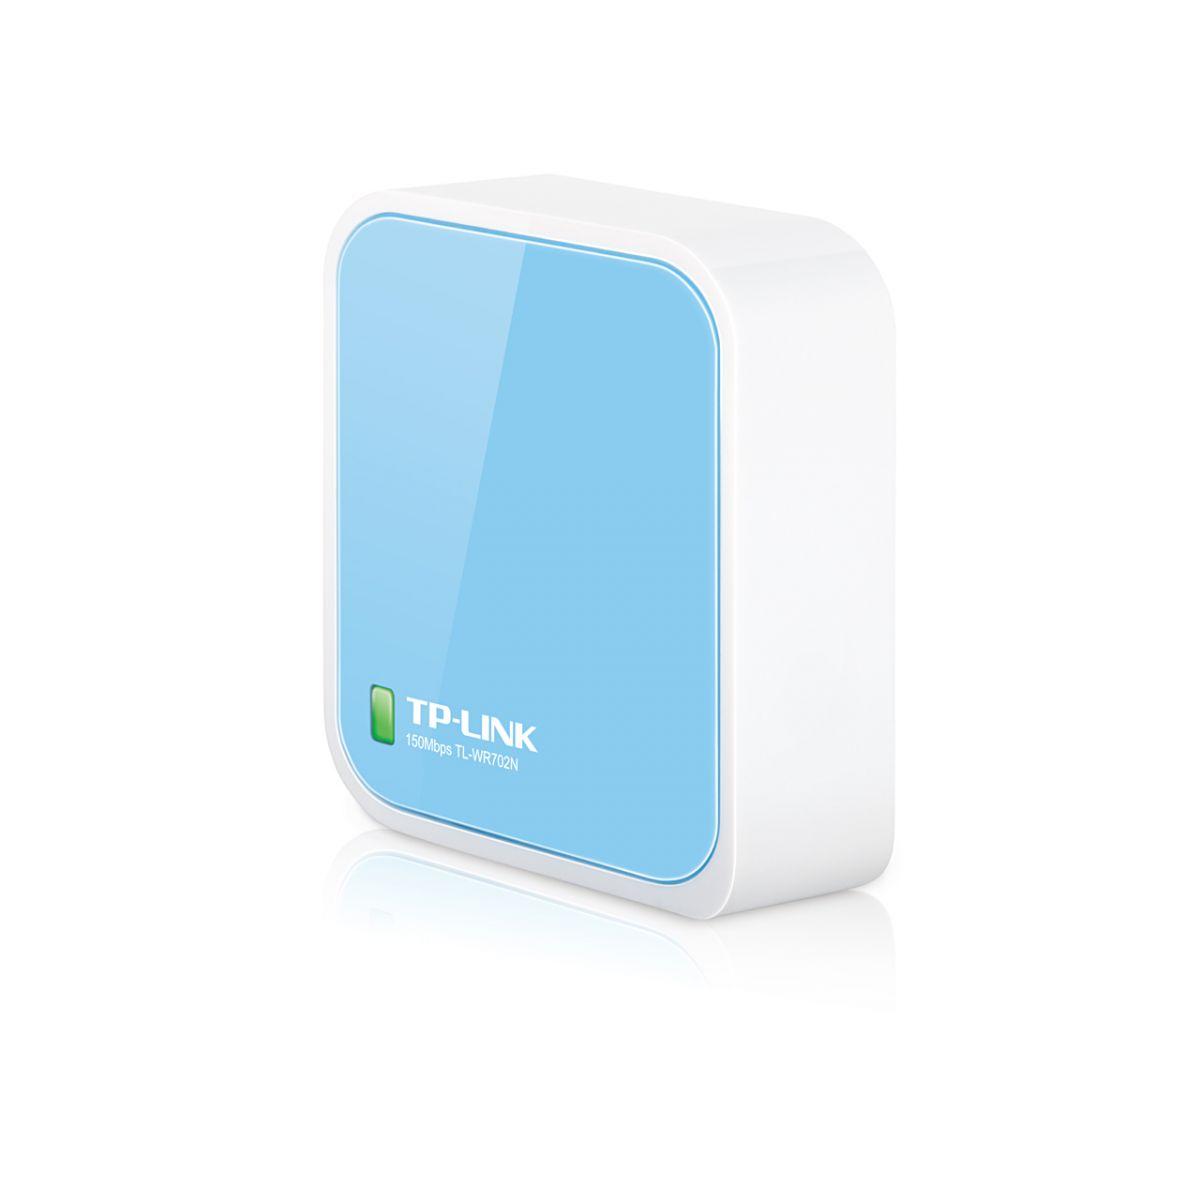 Roteador Portatil TP-Link Wireless N 150Mbps Nano TL-WR702N  - ShopNoroeste.com.br